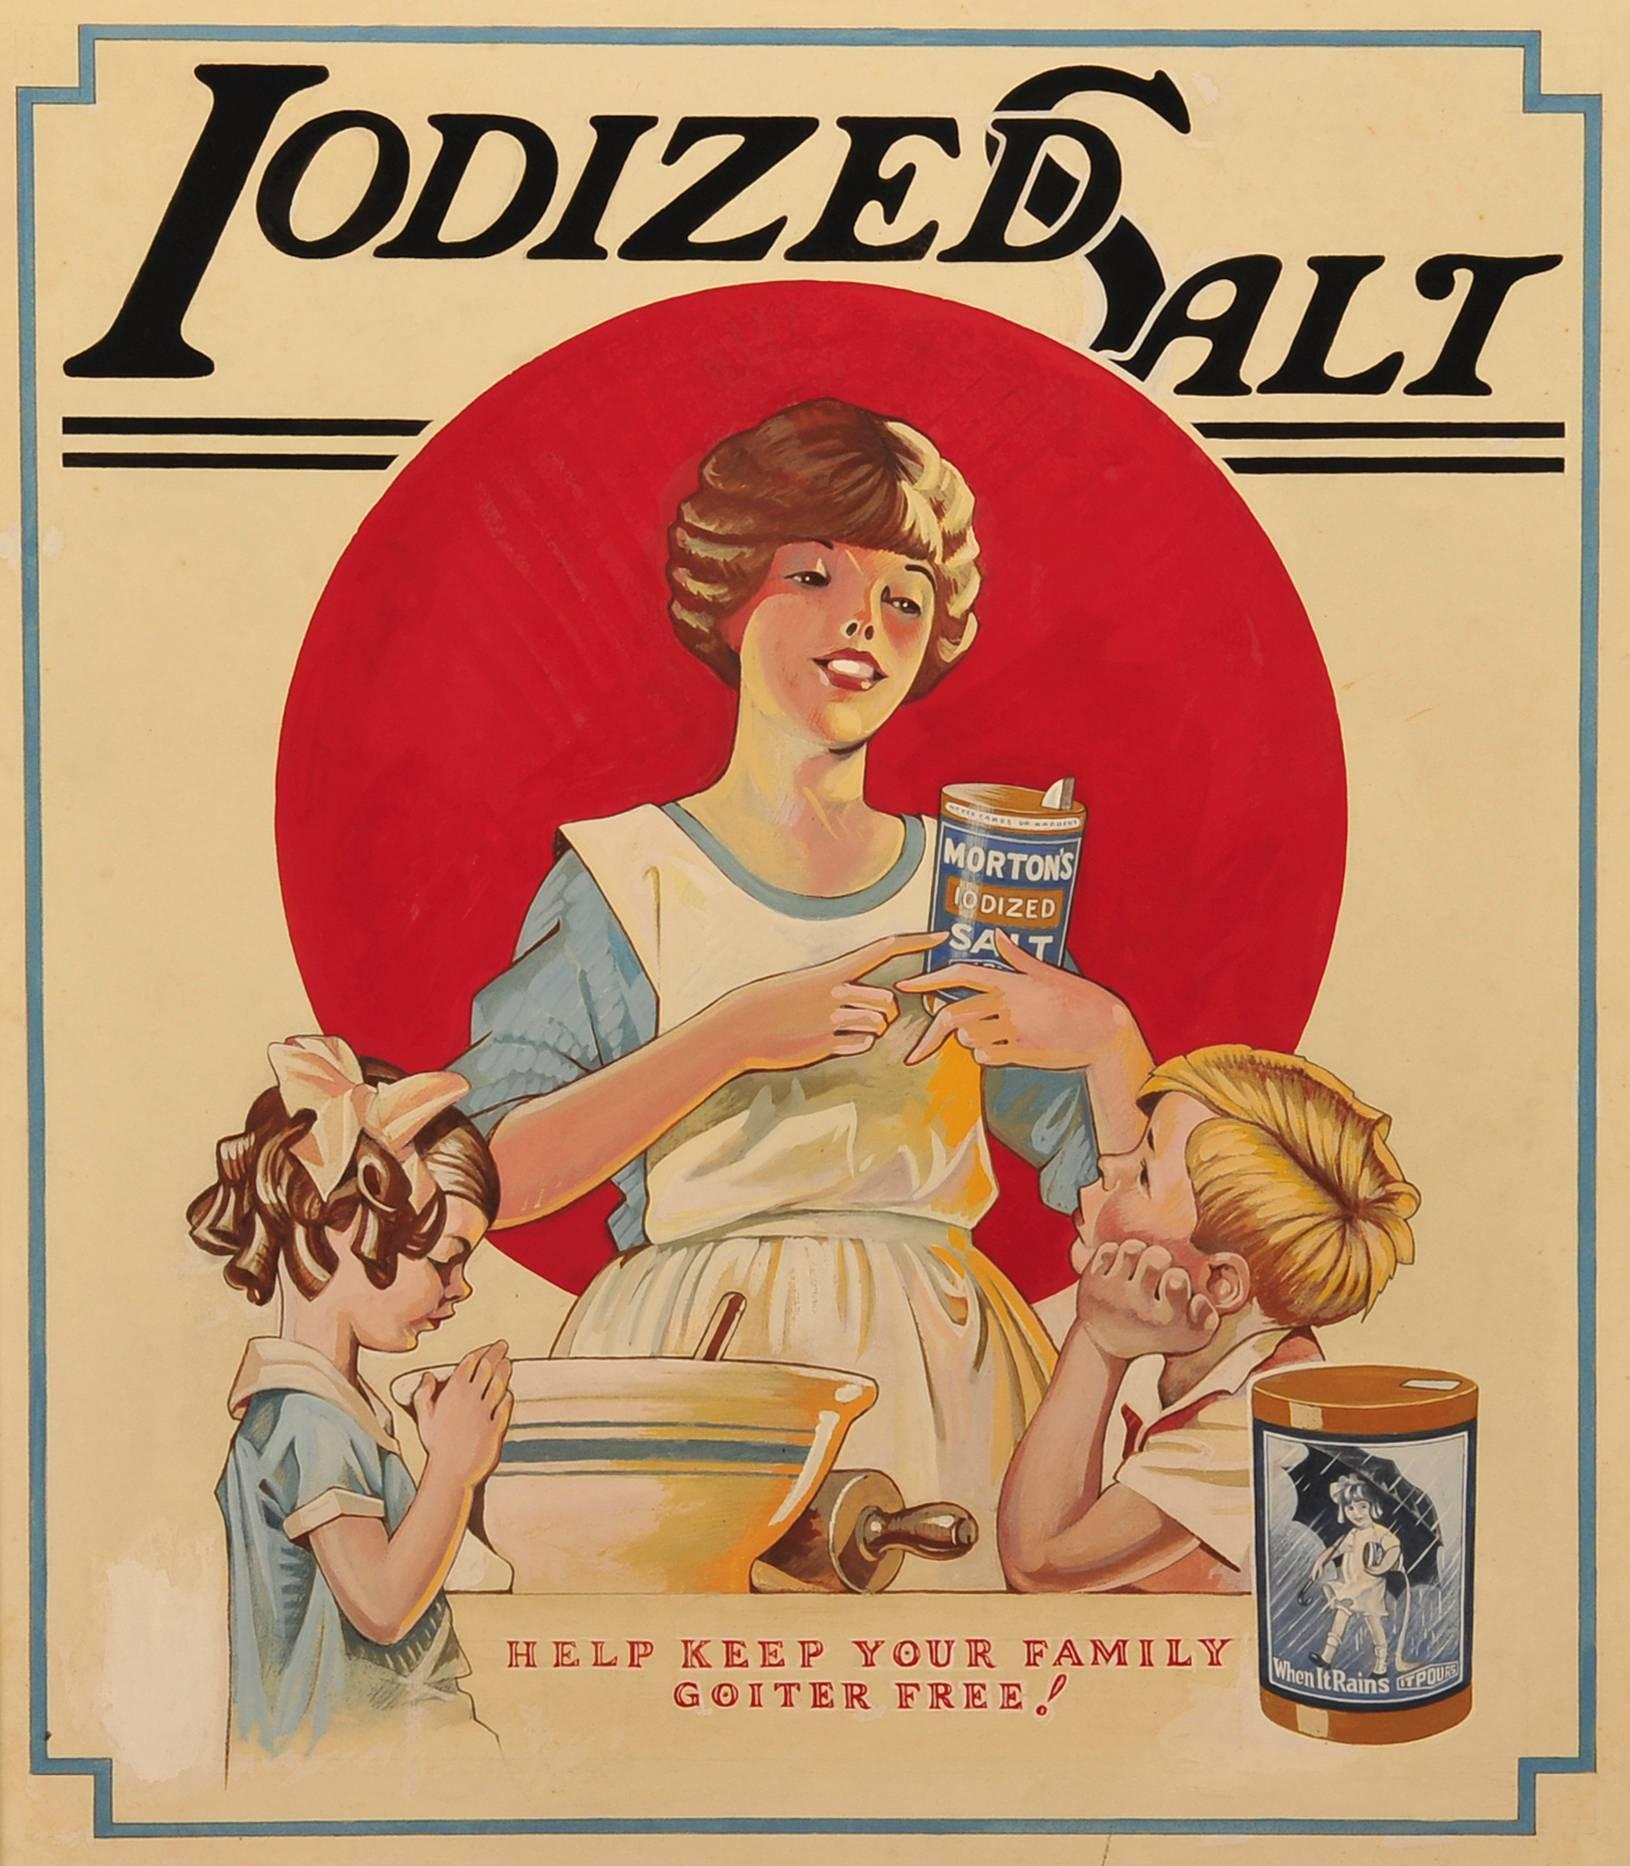 Iodized Salt / Help Keep Your Family Goiter Free